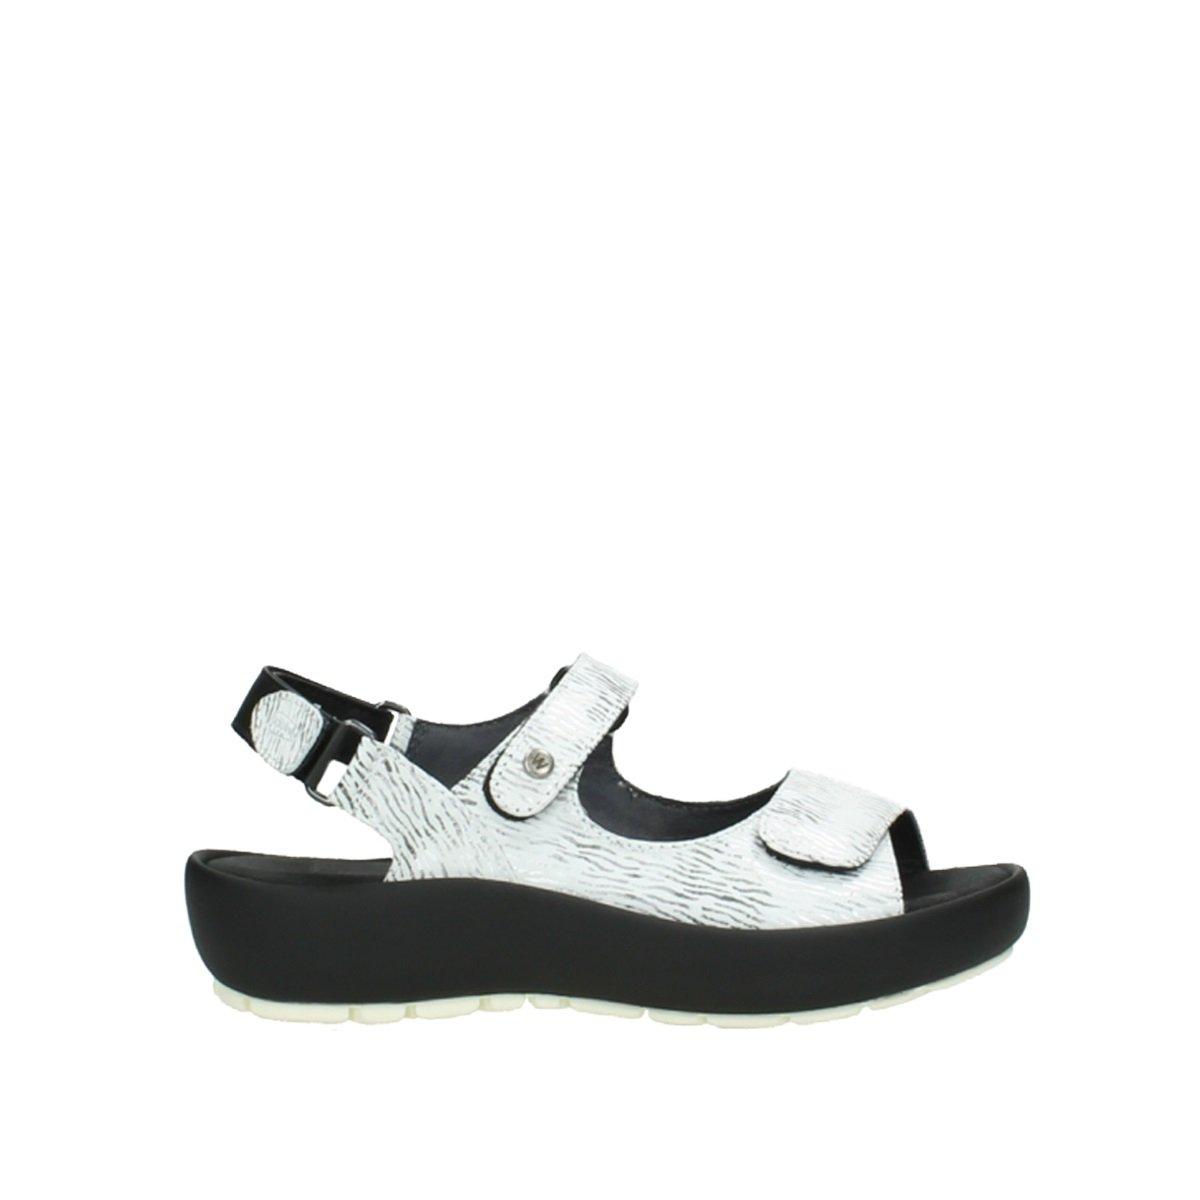 Wolky Comfort Rio B06XDKHJYX 44 EU|70110 White/Black Canal Leather